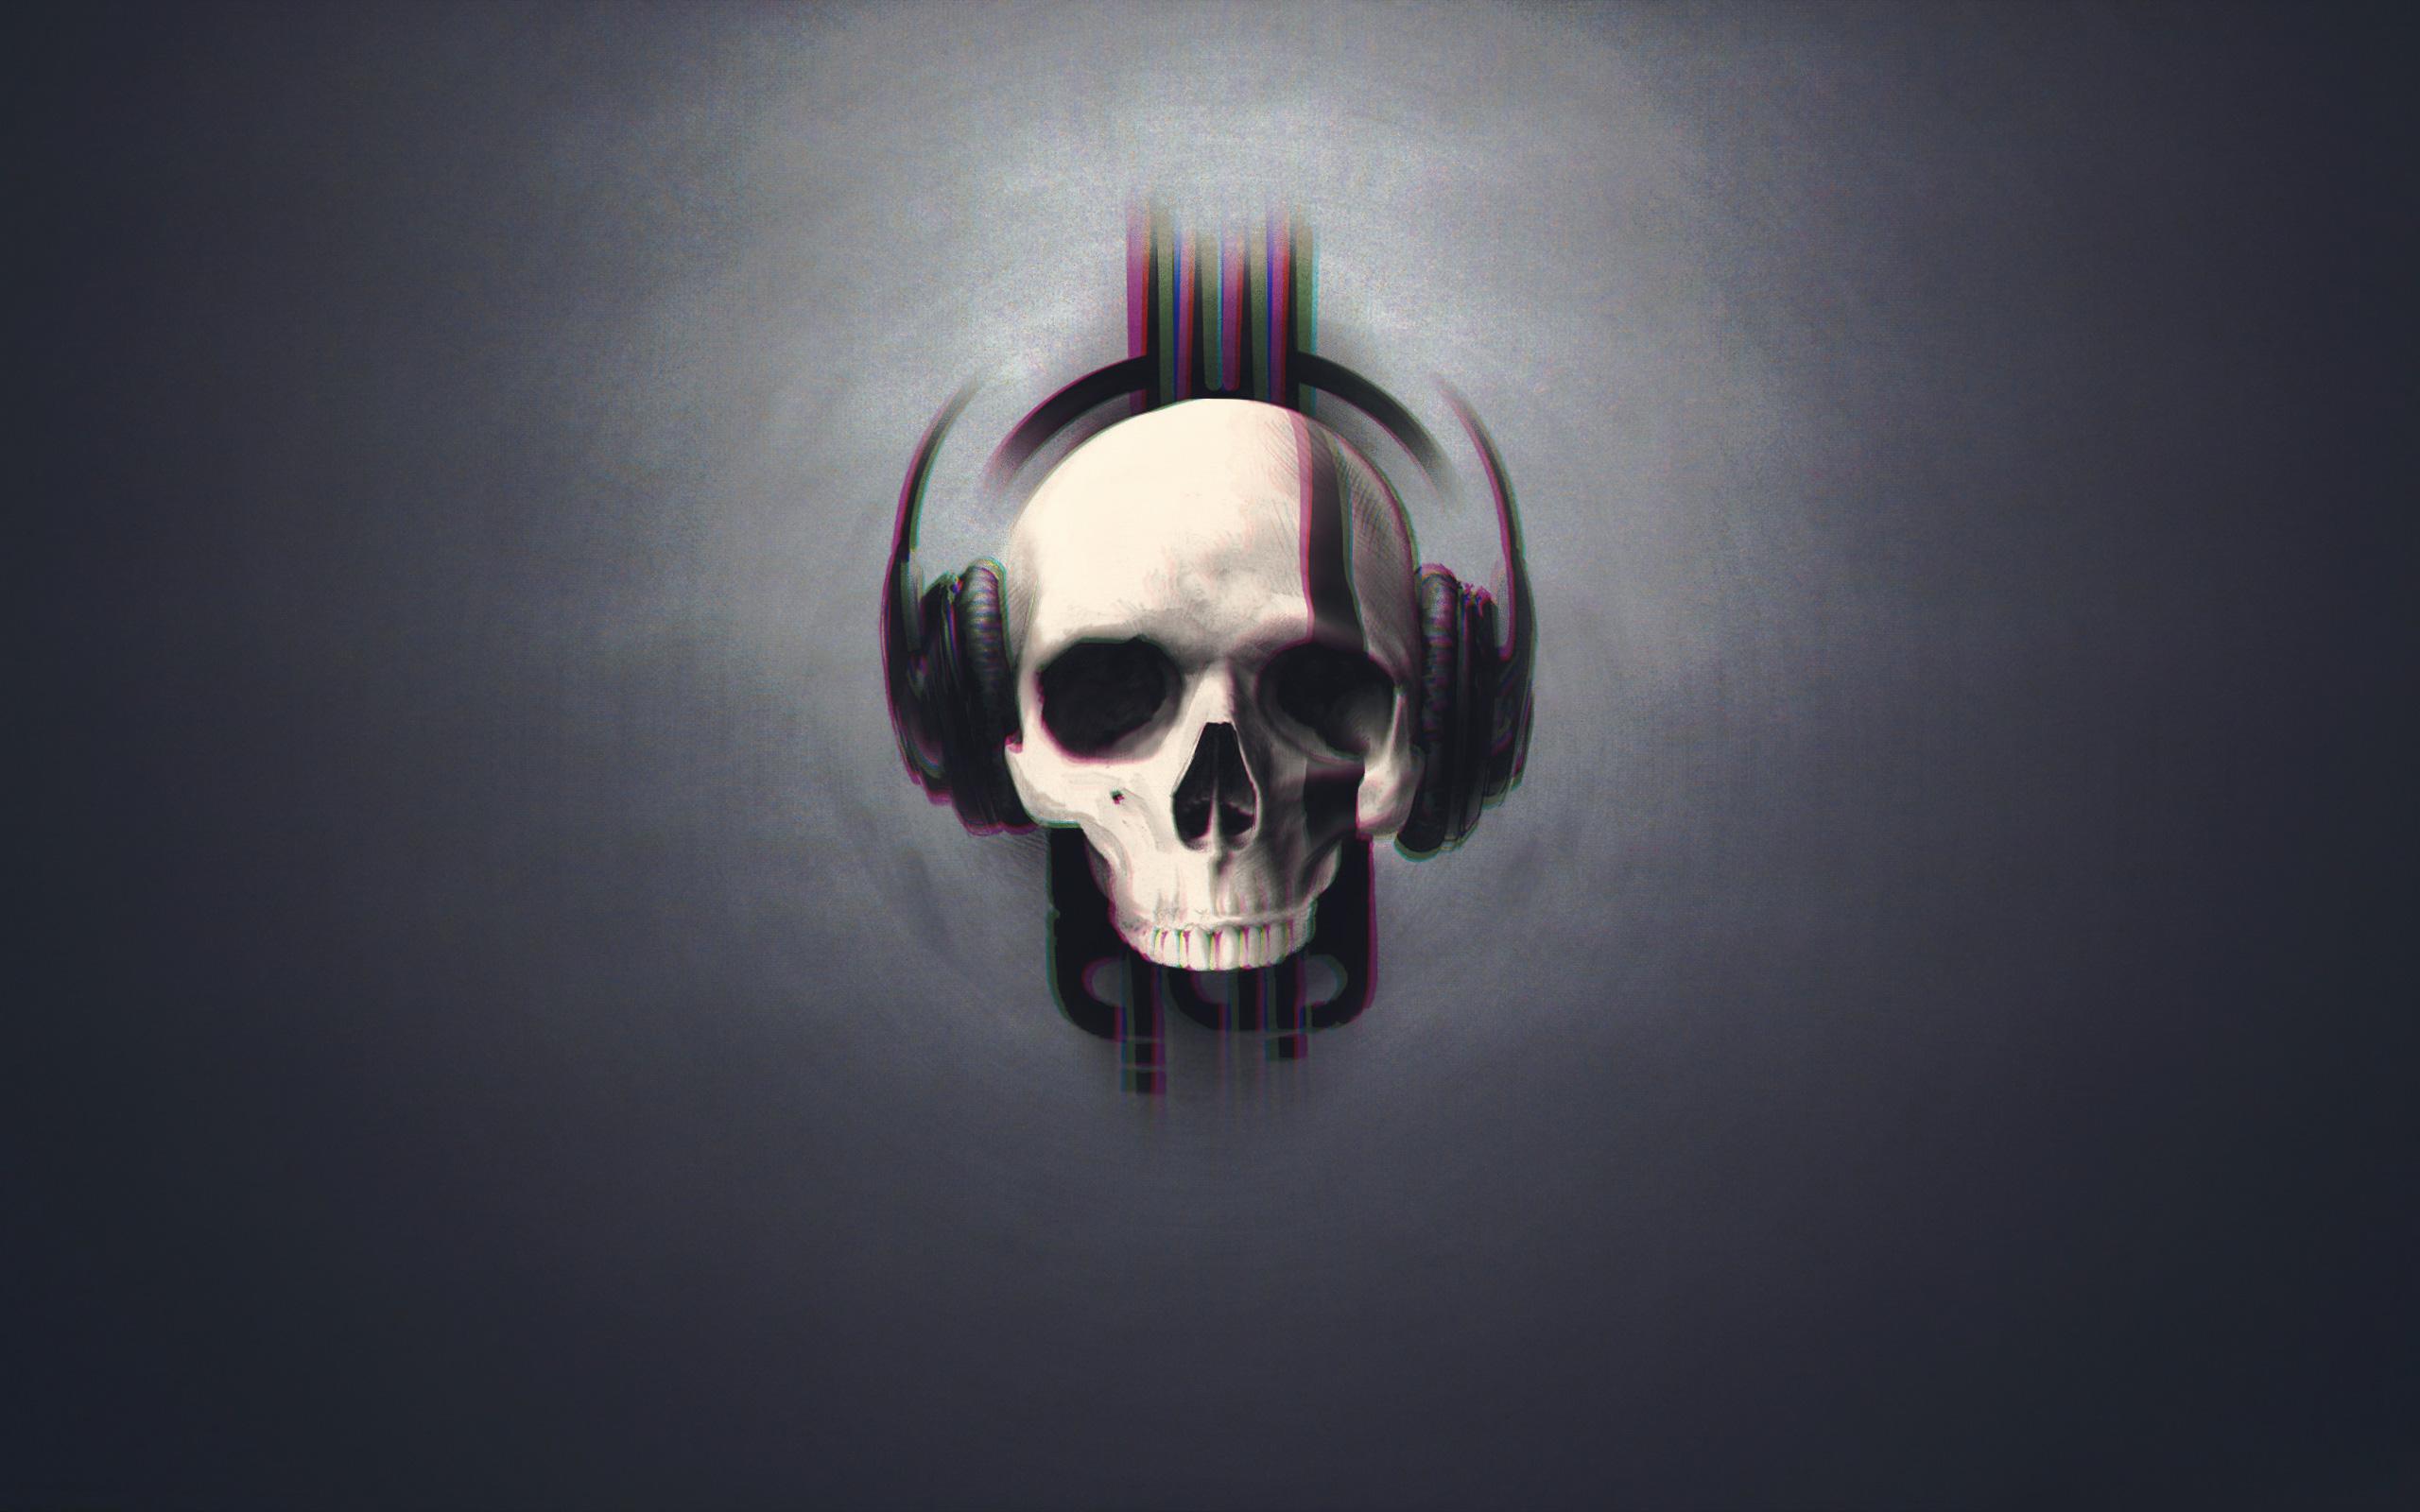 Skull Wallpaper Hd Iphone 7   Babangrichie org